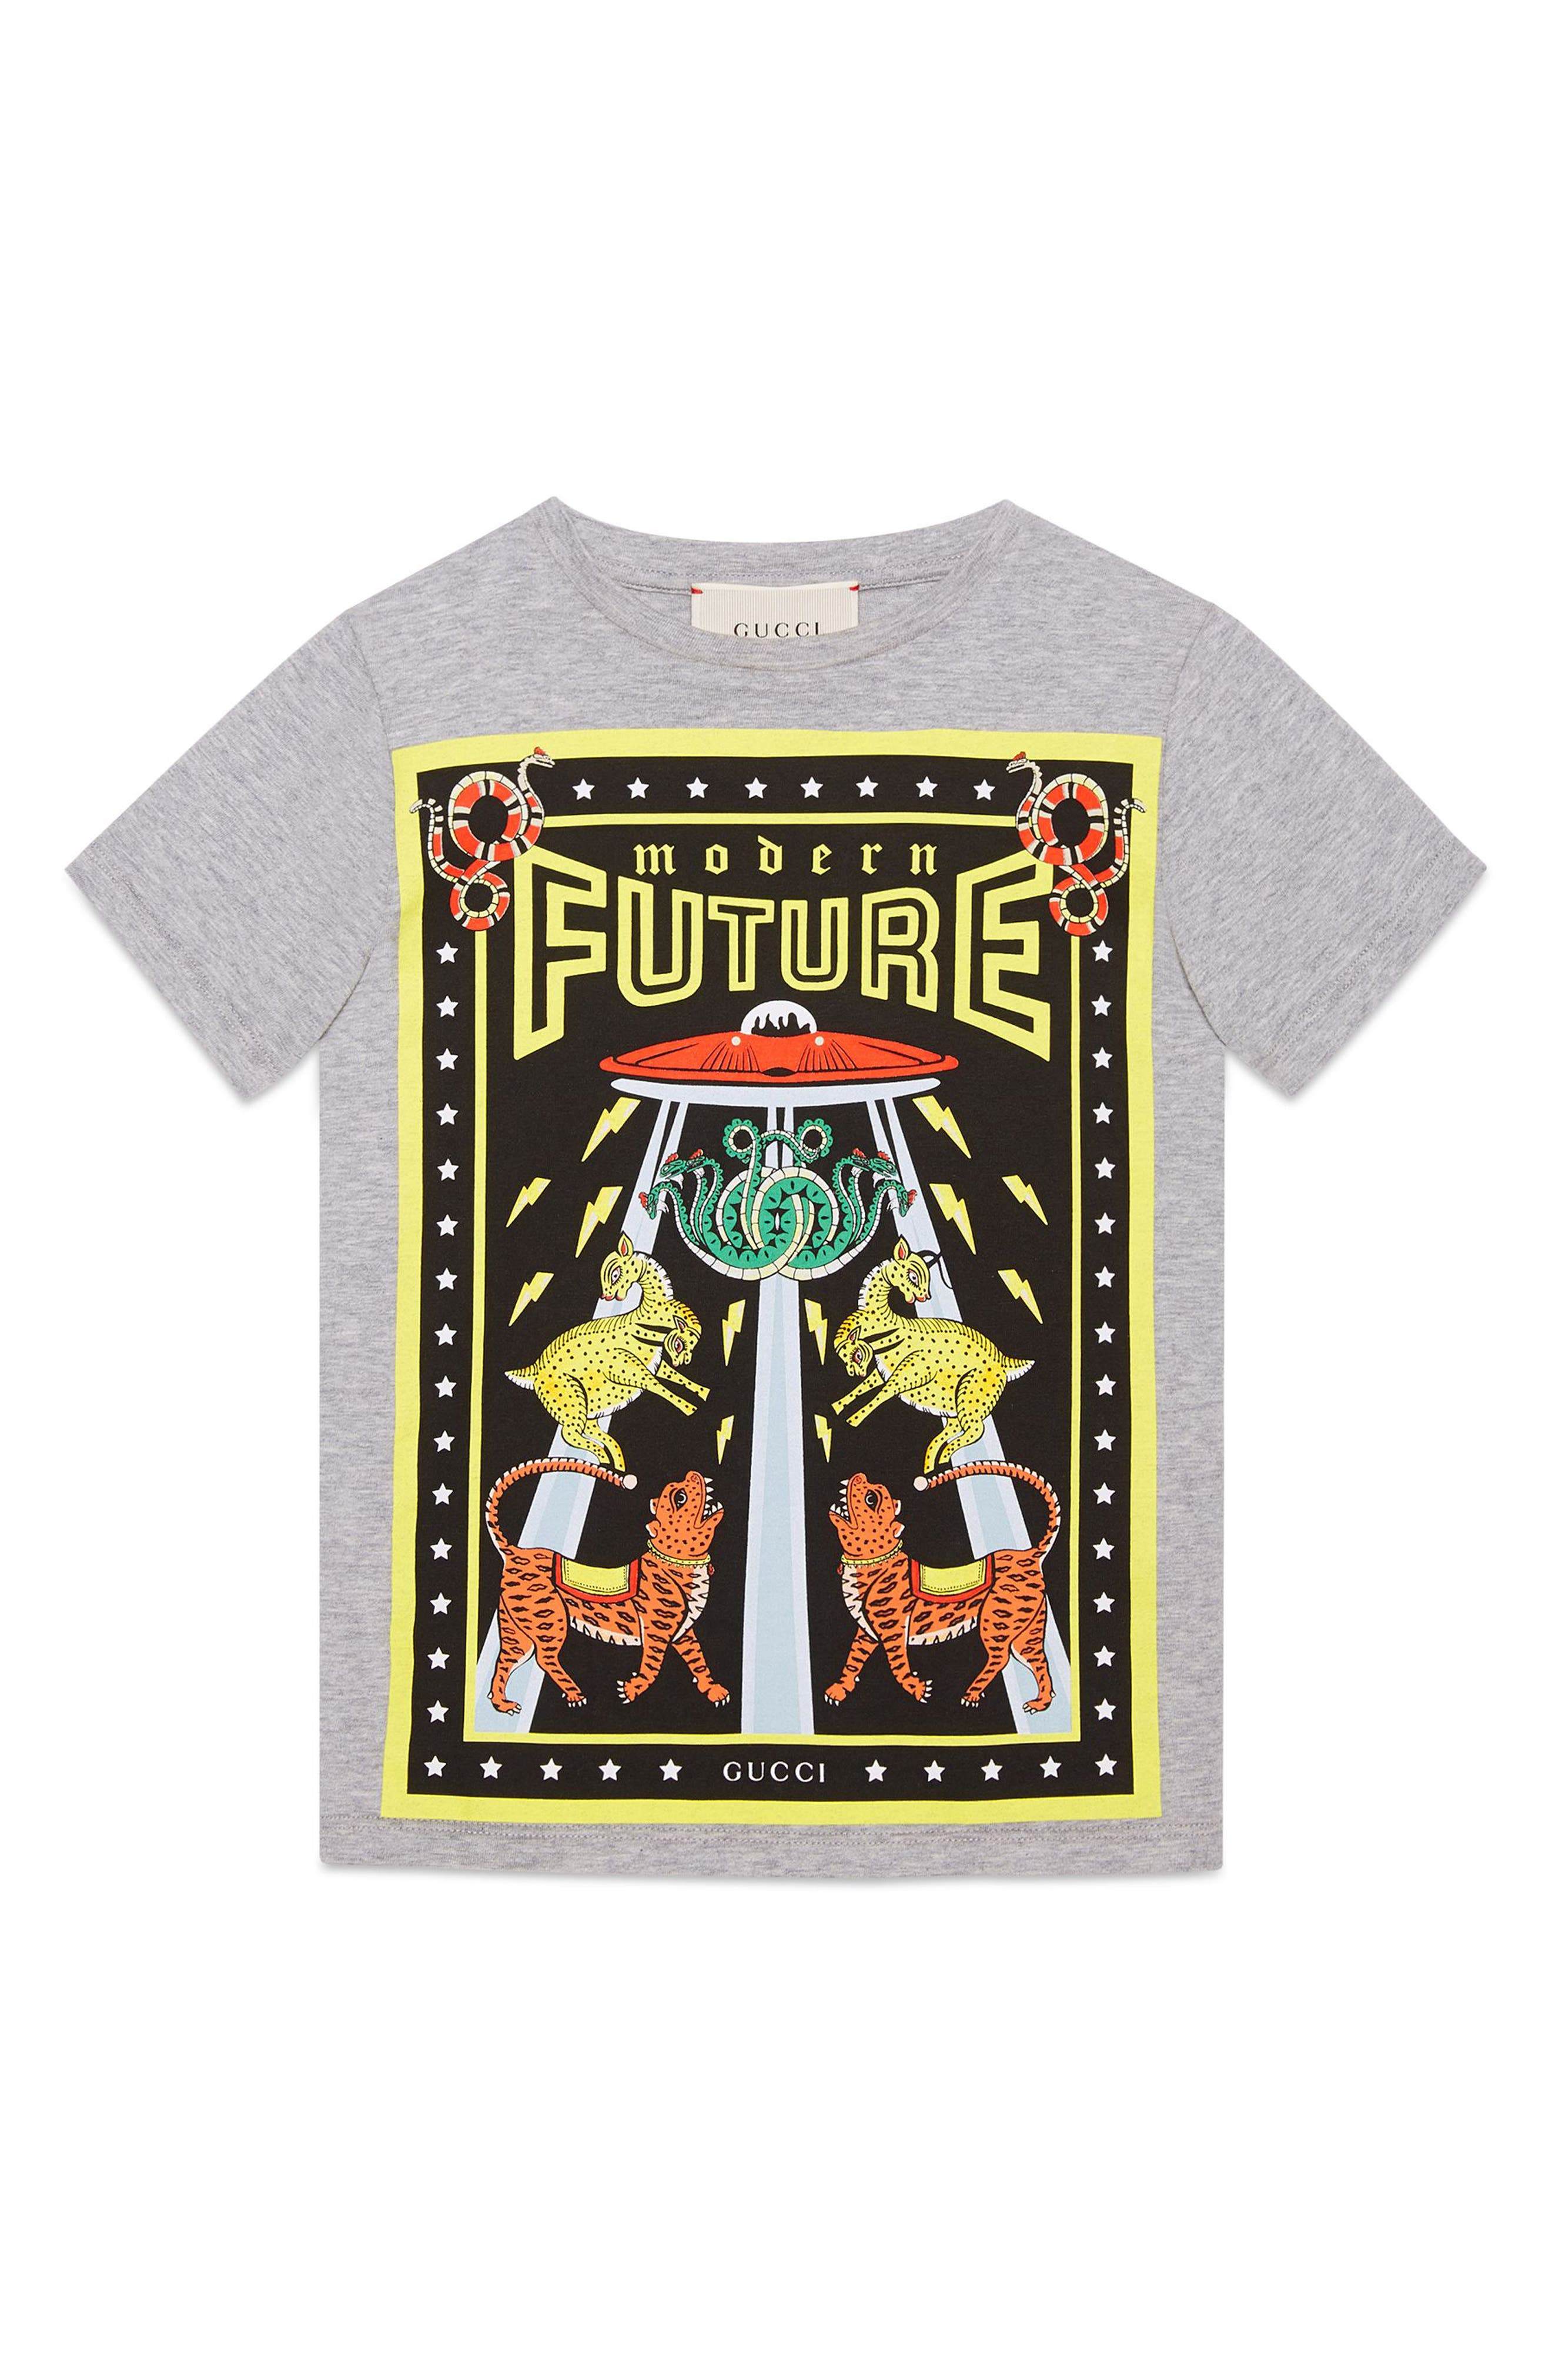 Gucci Modern Future Graphic Print T-Shirt (Little Boys & Big Boys)